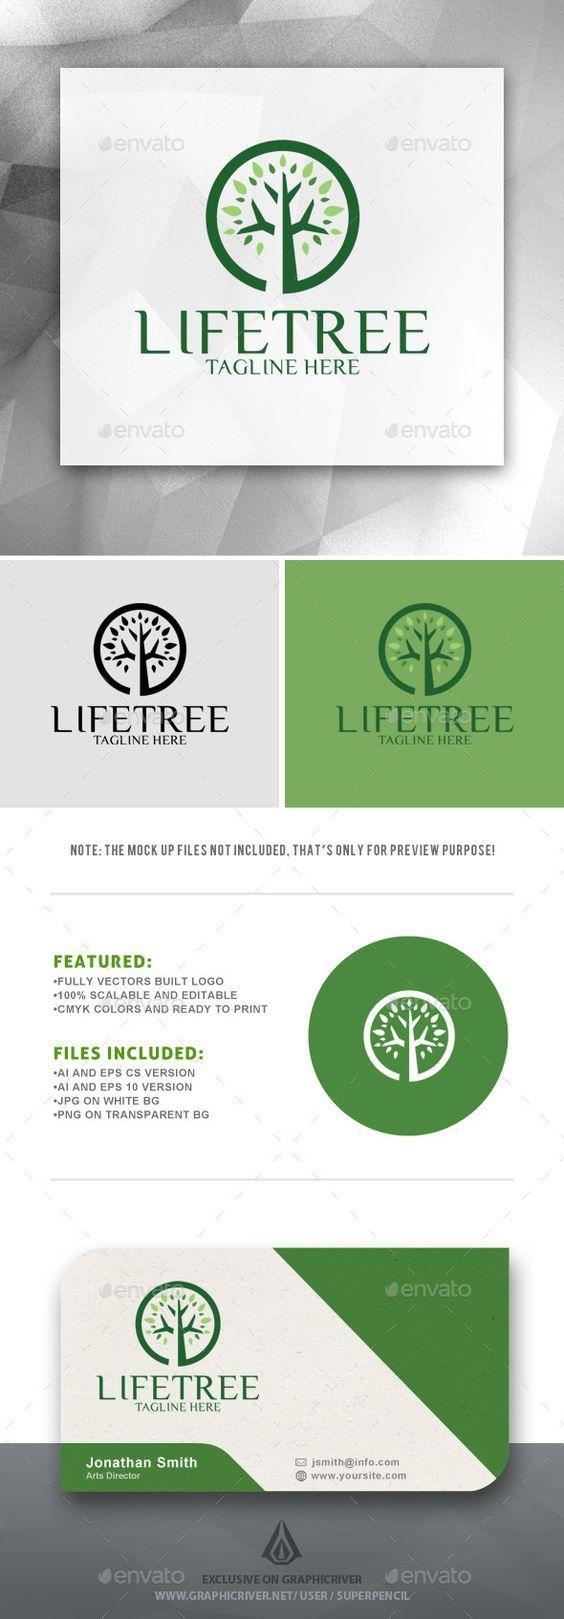 Life Tree Logo (JPG Image, Vector EPS, AI Illustrator, Resizable, CS, app, center, circle tree, eco, ecology logo, environment, food, forest, fund, garden, green, grow, health, leaf, life, live, nature, organic, outdoors, outside, park, plant, power, sharp, smart, spa, tree, wood):